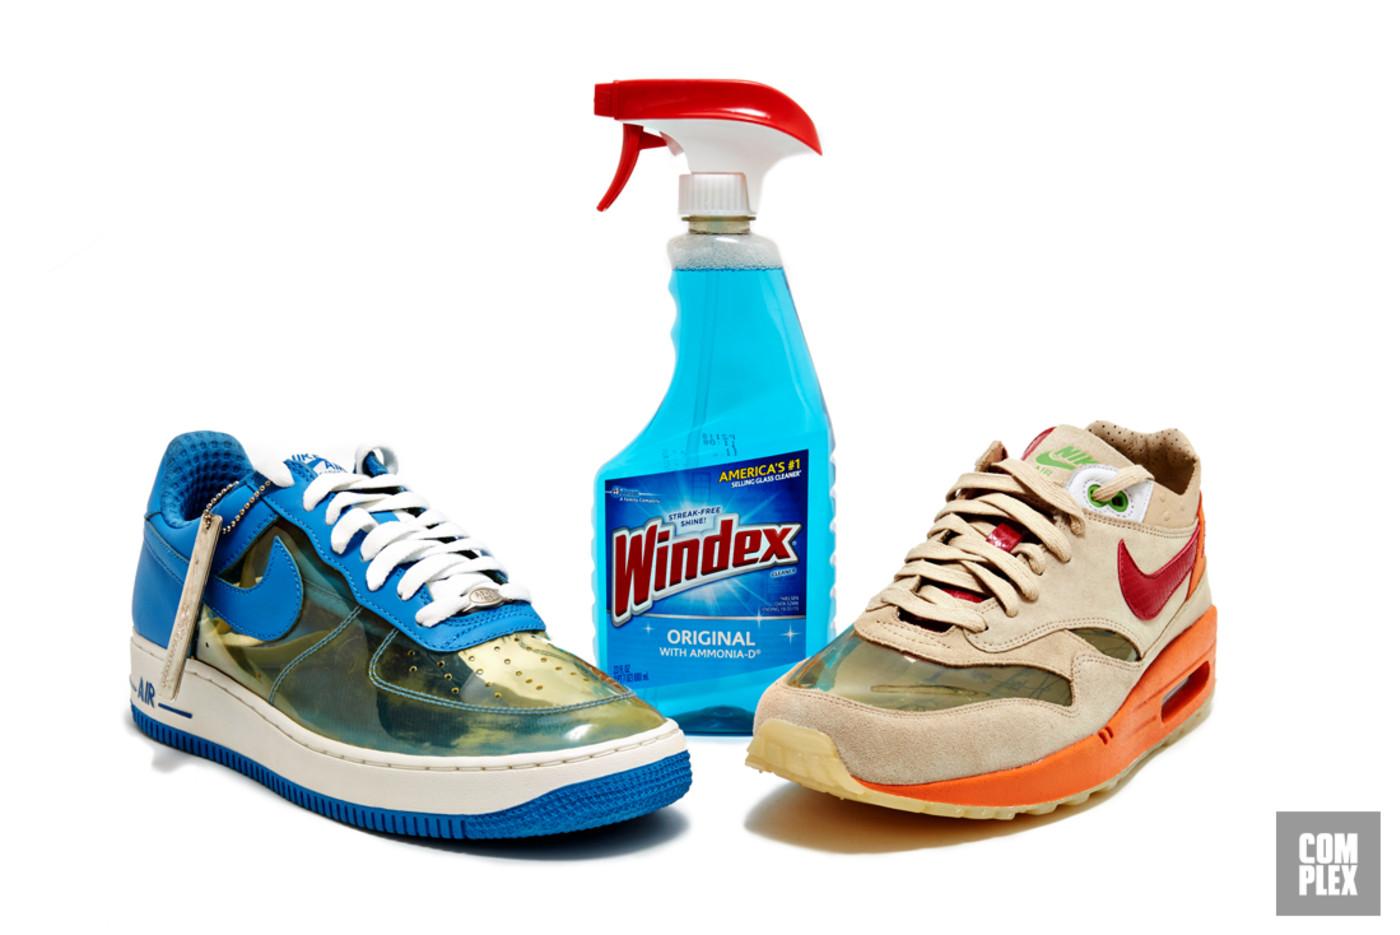 Sumamente elegante Custodio Producto  Remember When See-Through Nikes Took Over Sneaker Culture? | Complex